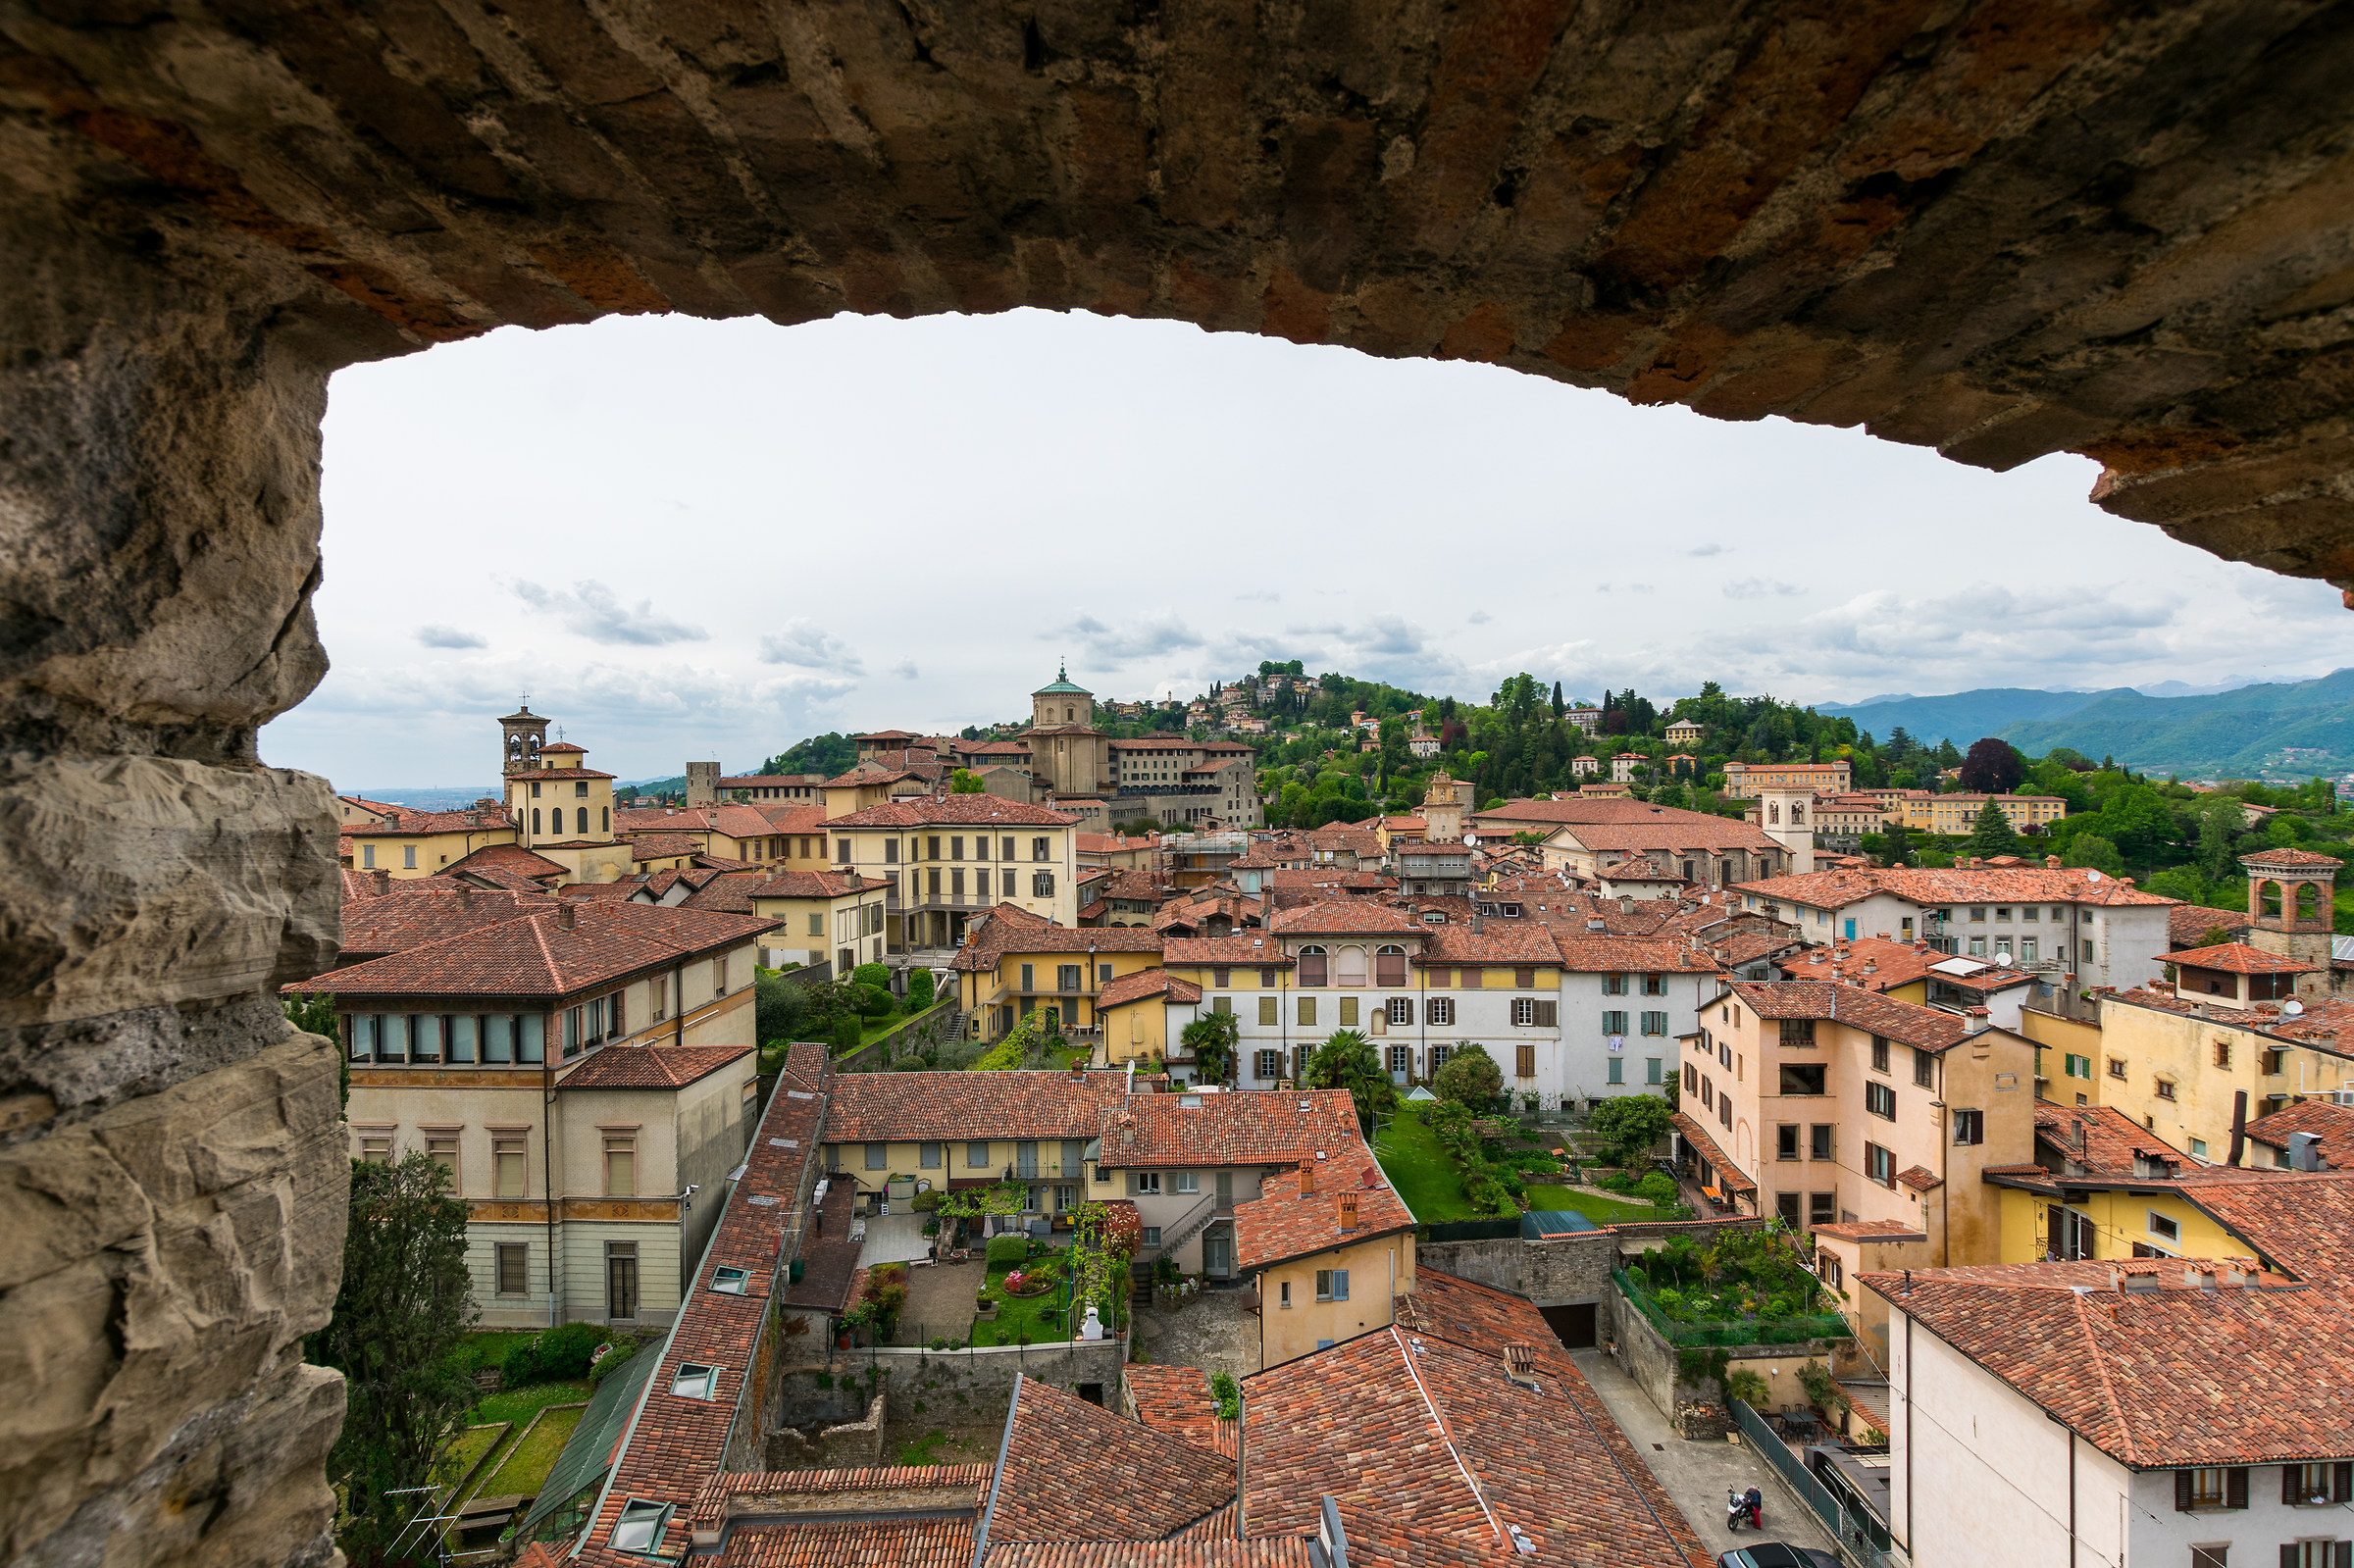 Upper town and its hills, Bergamo....